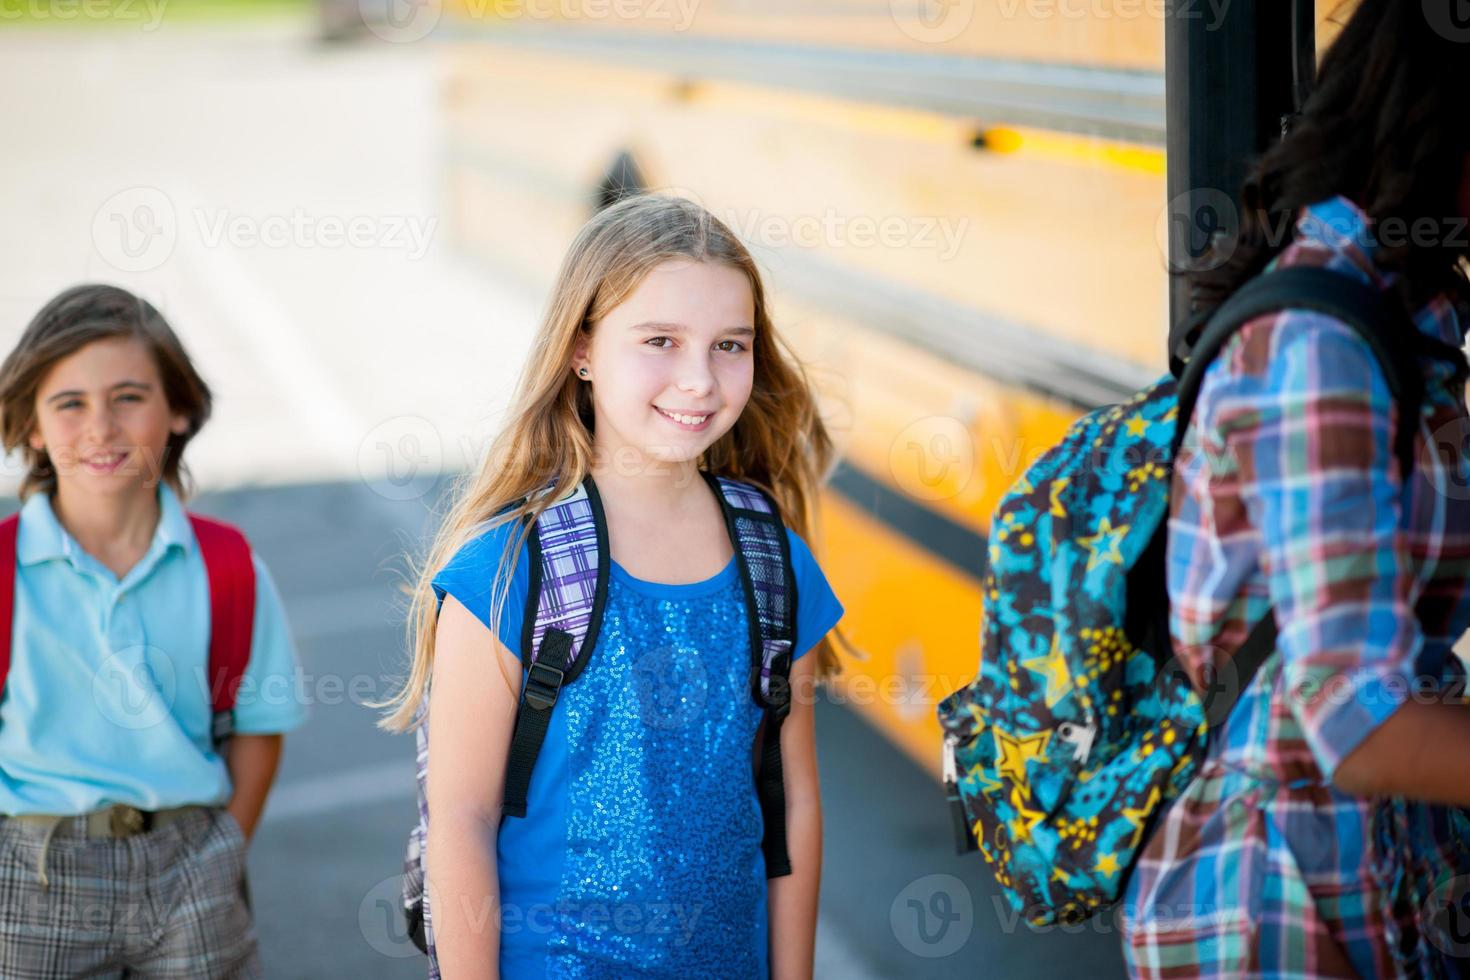 Elementary School Bus photo